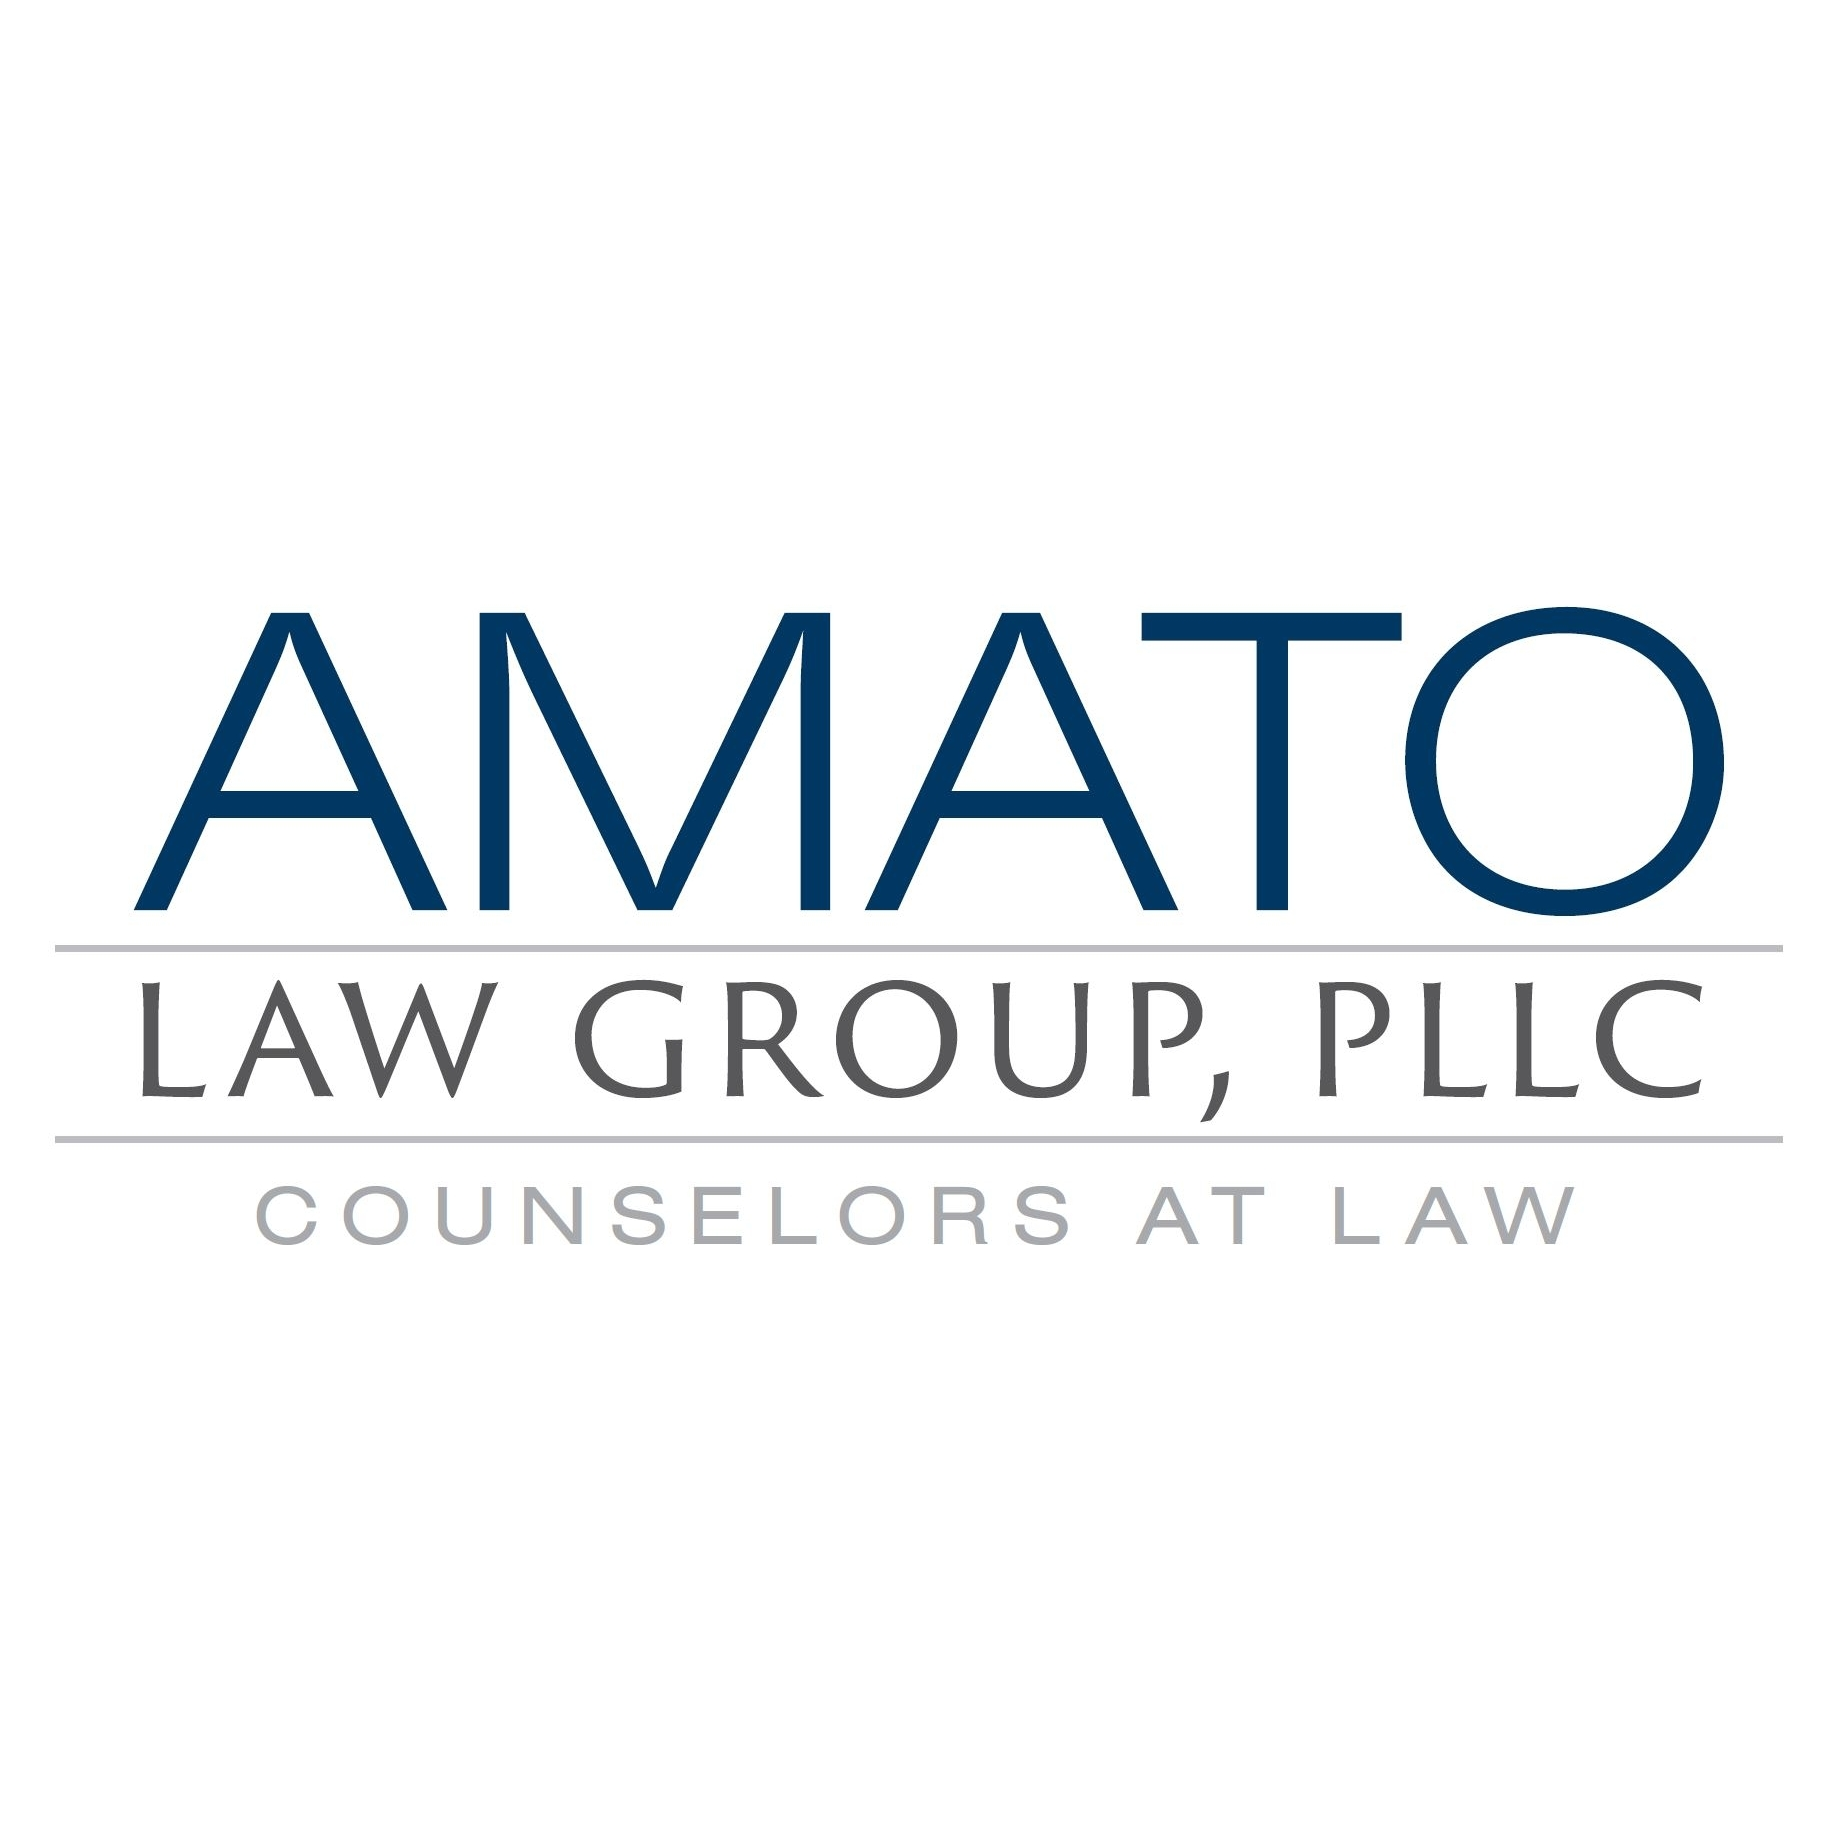 Amato Law Group PLLC